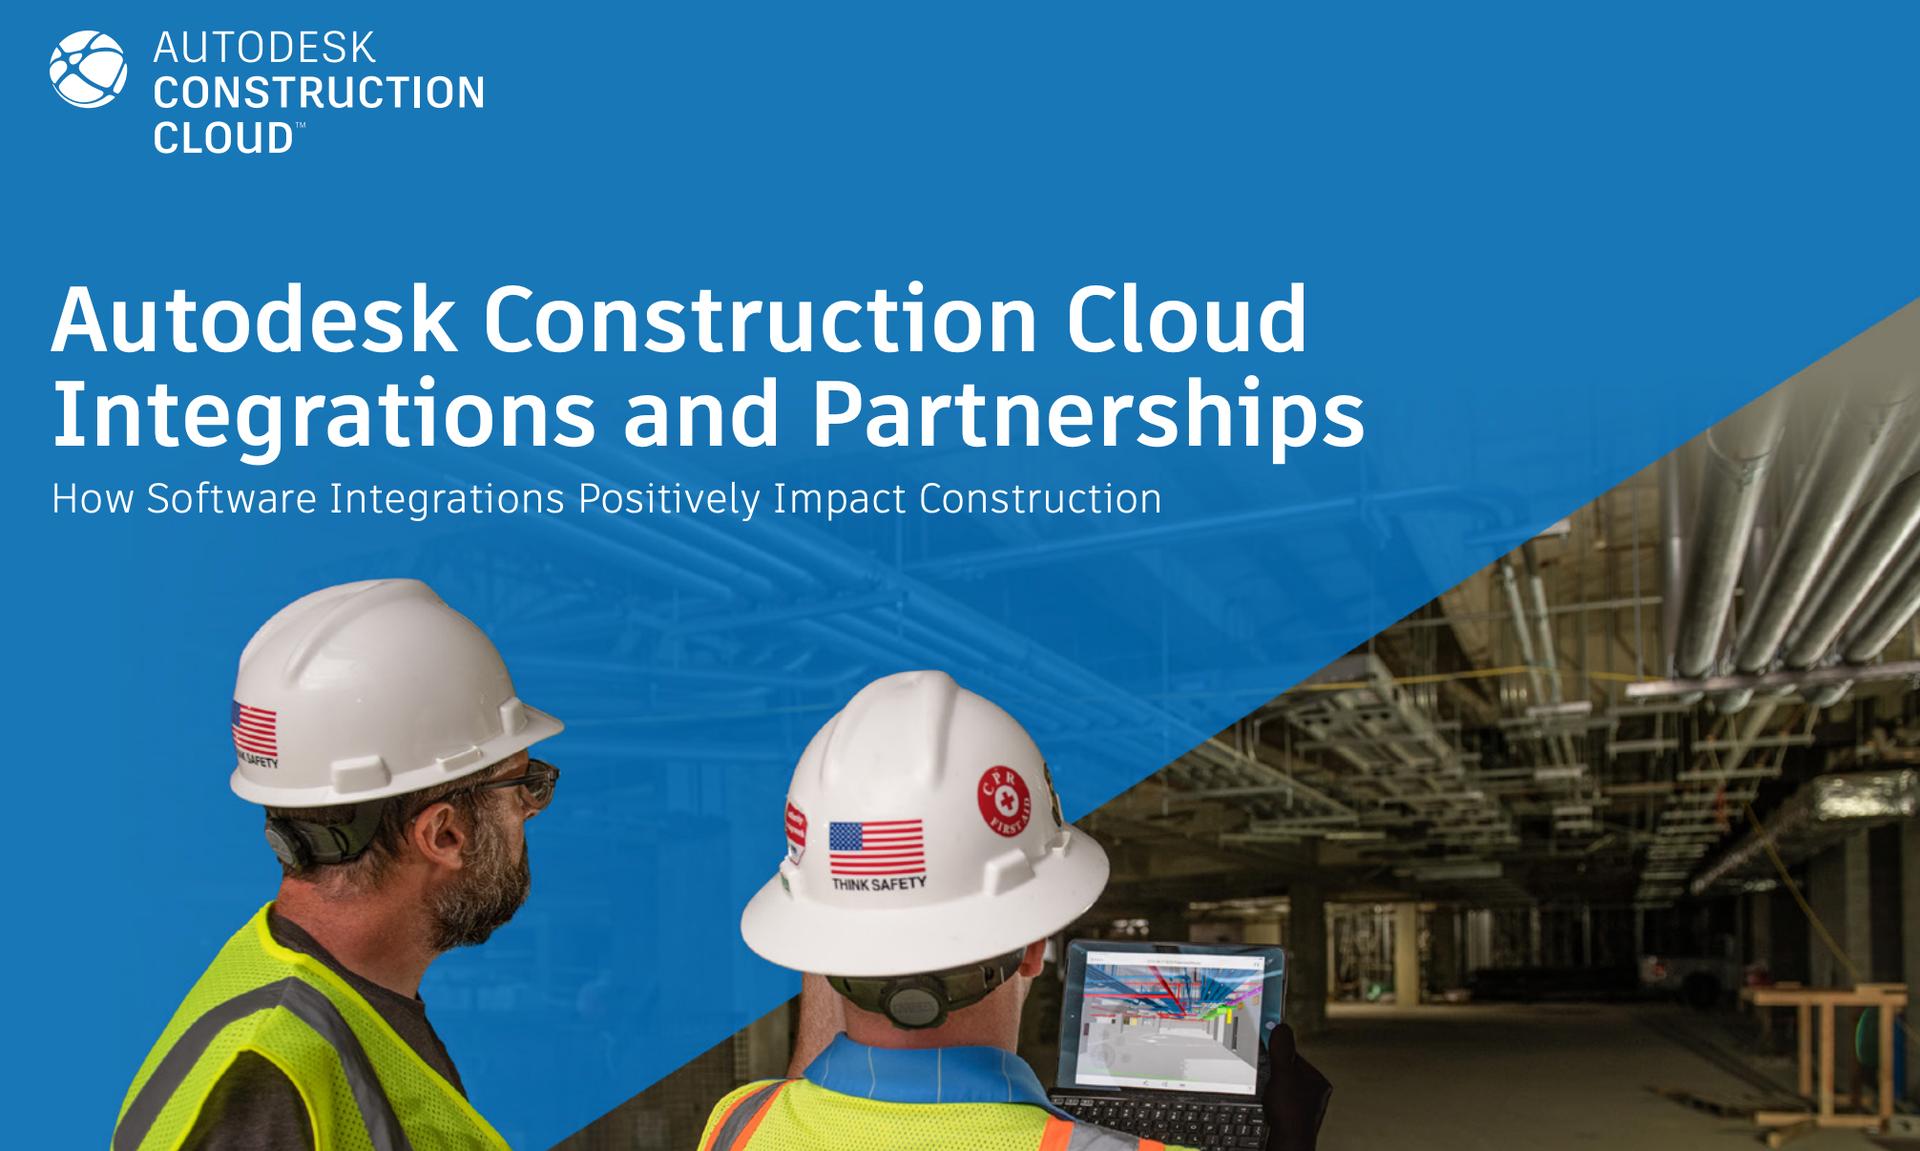 autodesk-construction-cloud-integrations-and-partnerships